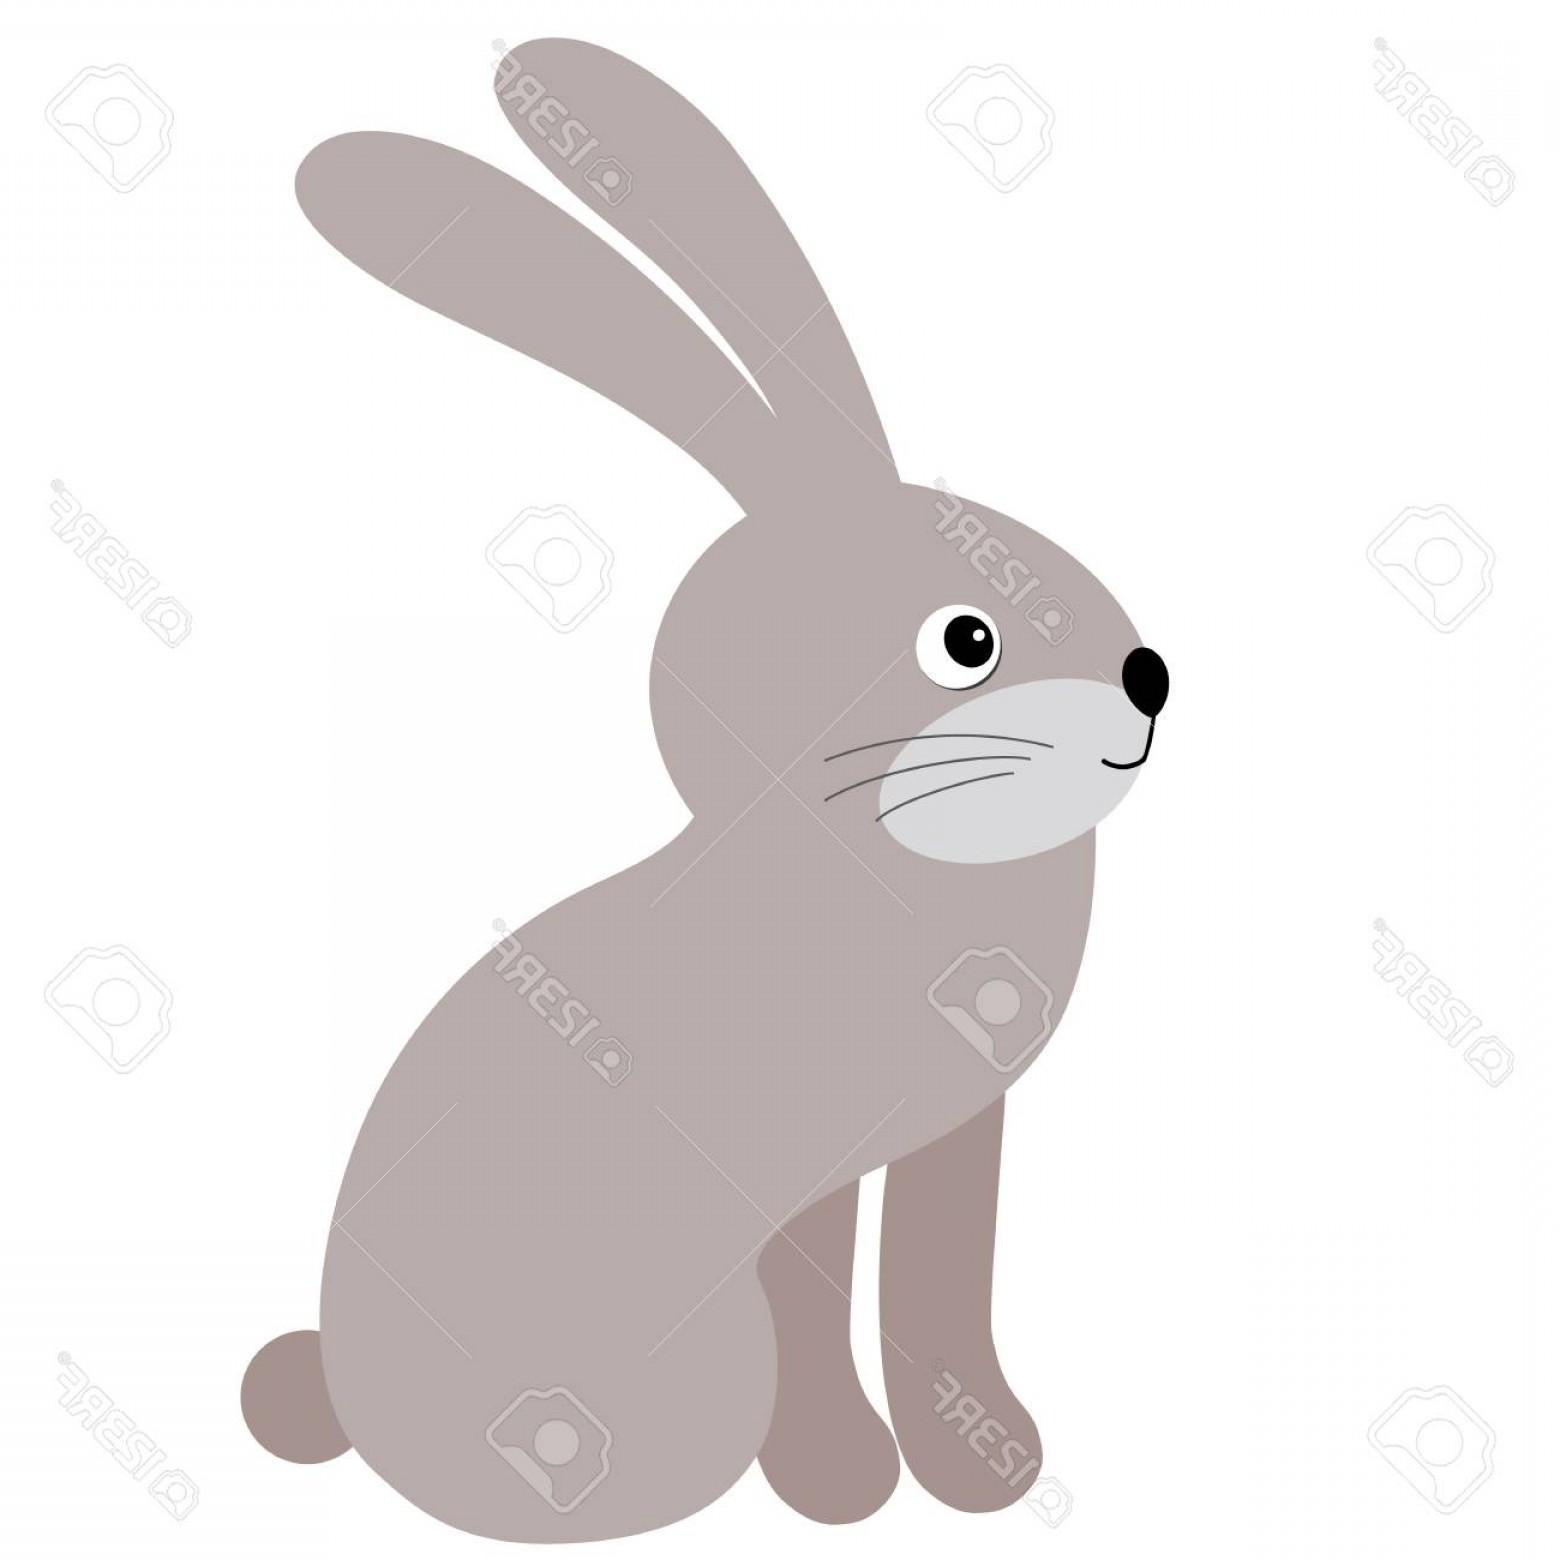 1560x1560 Photostock Vector Vector Cute Cartoon Rabbit Vector Hare Bunny